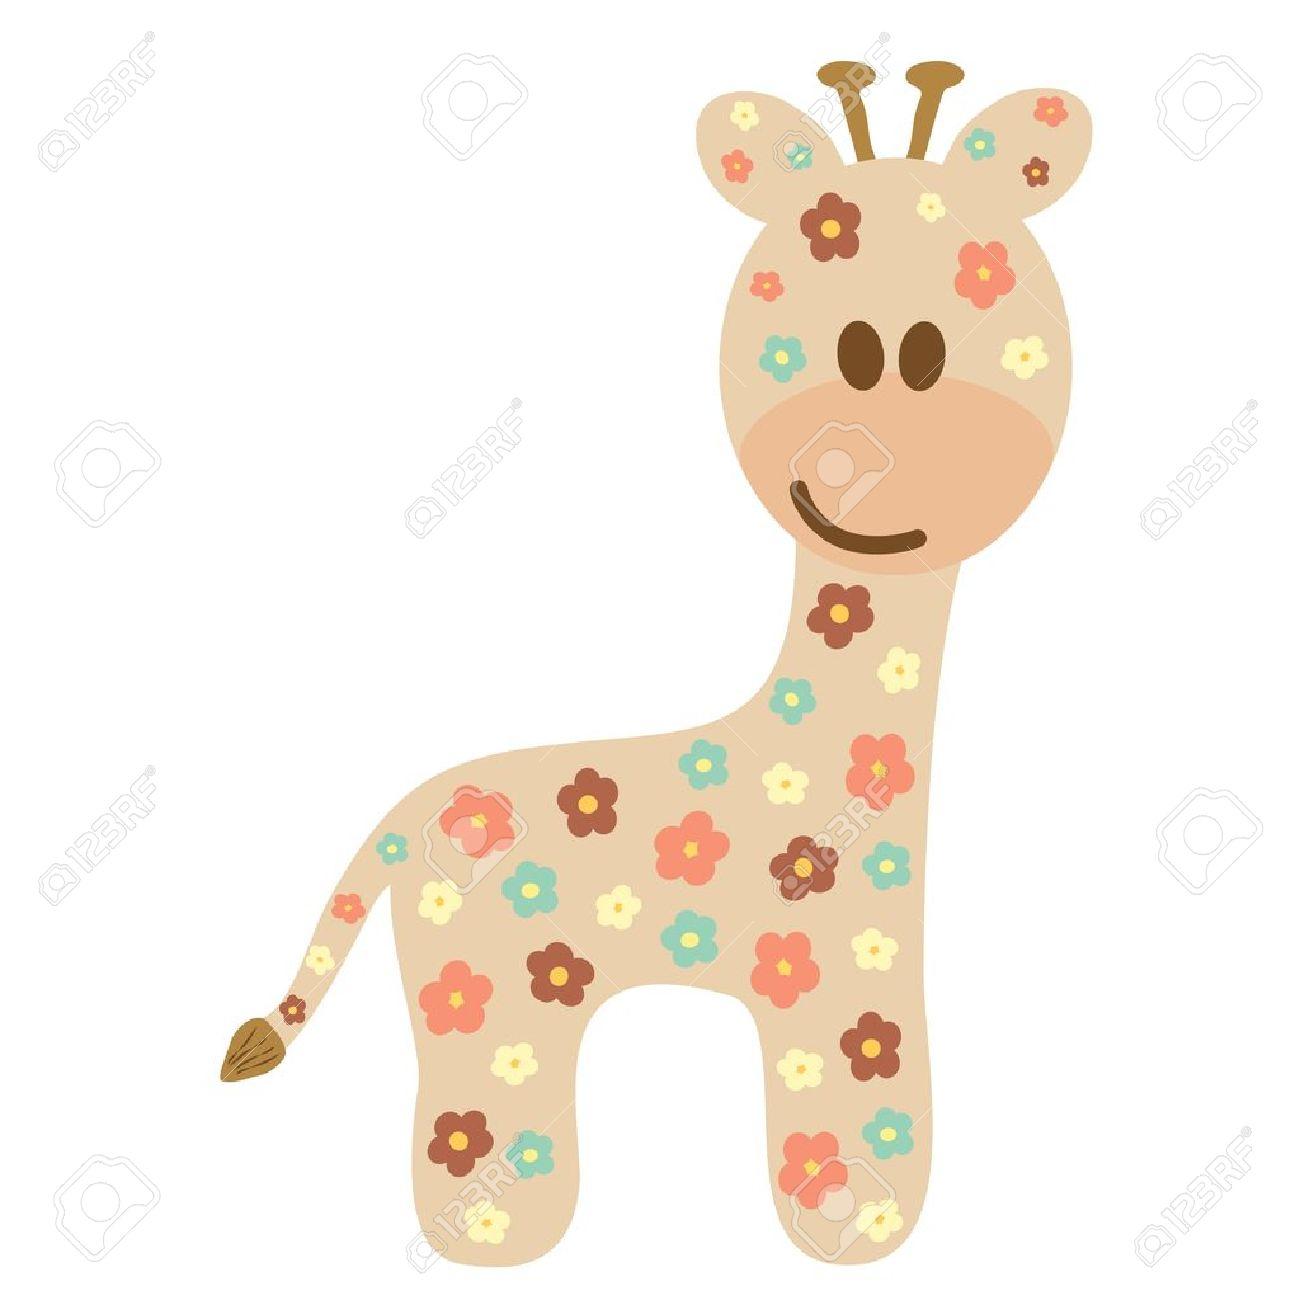 Baby giraffe like a cute style - 17382055